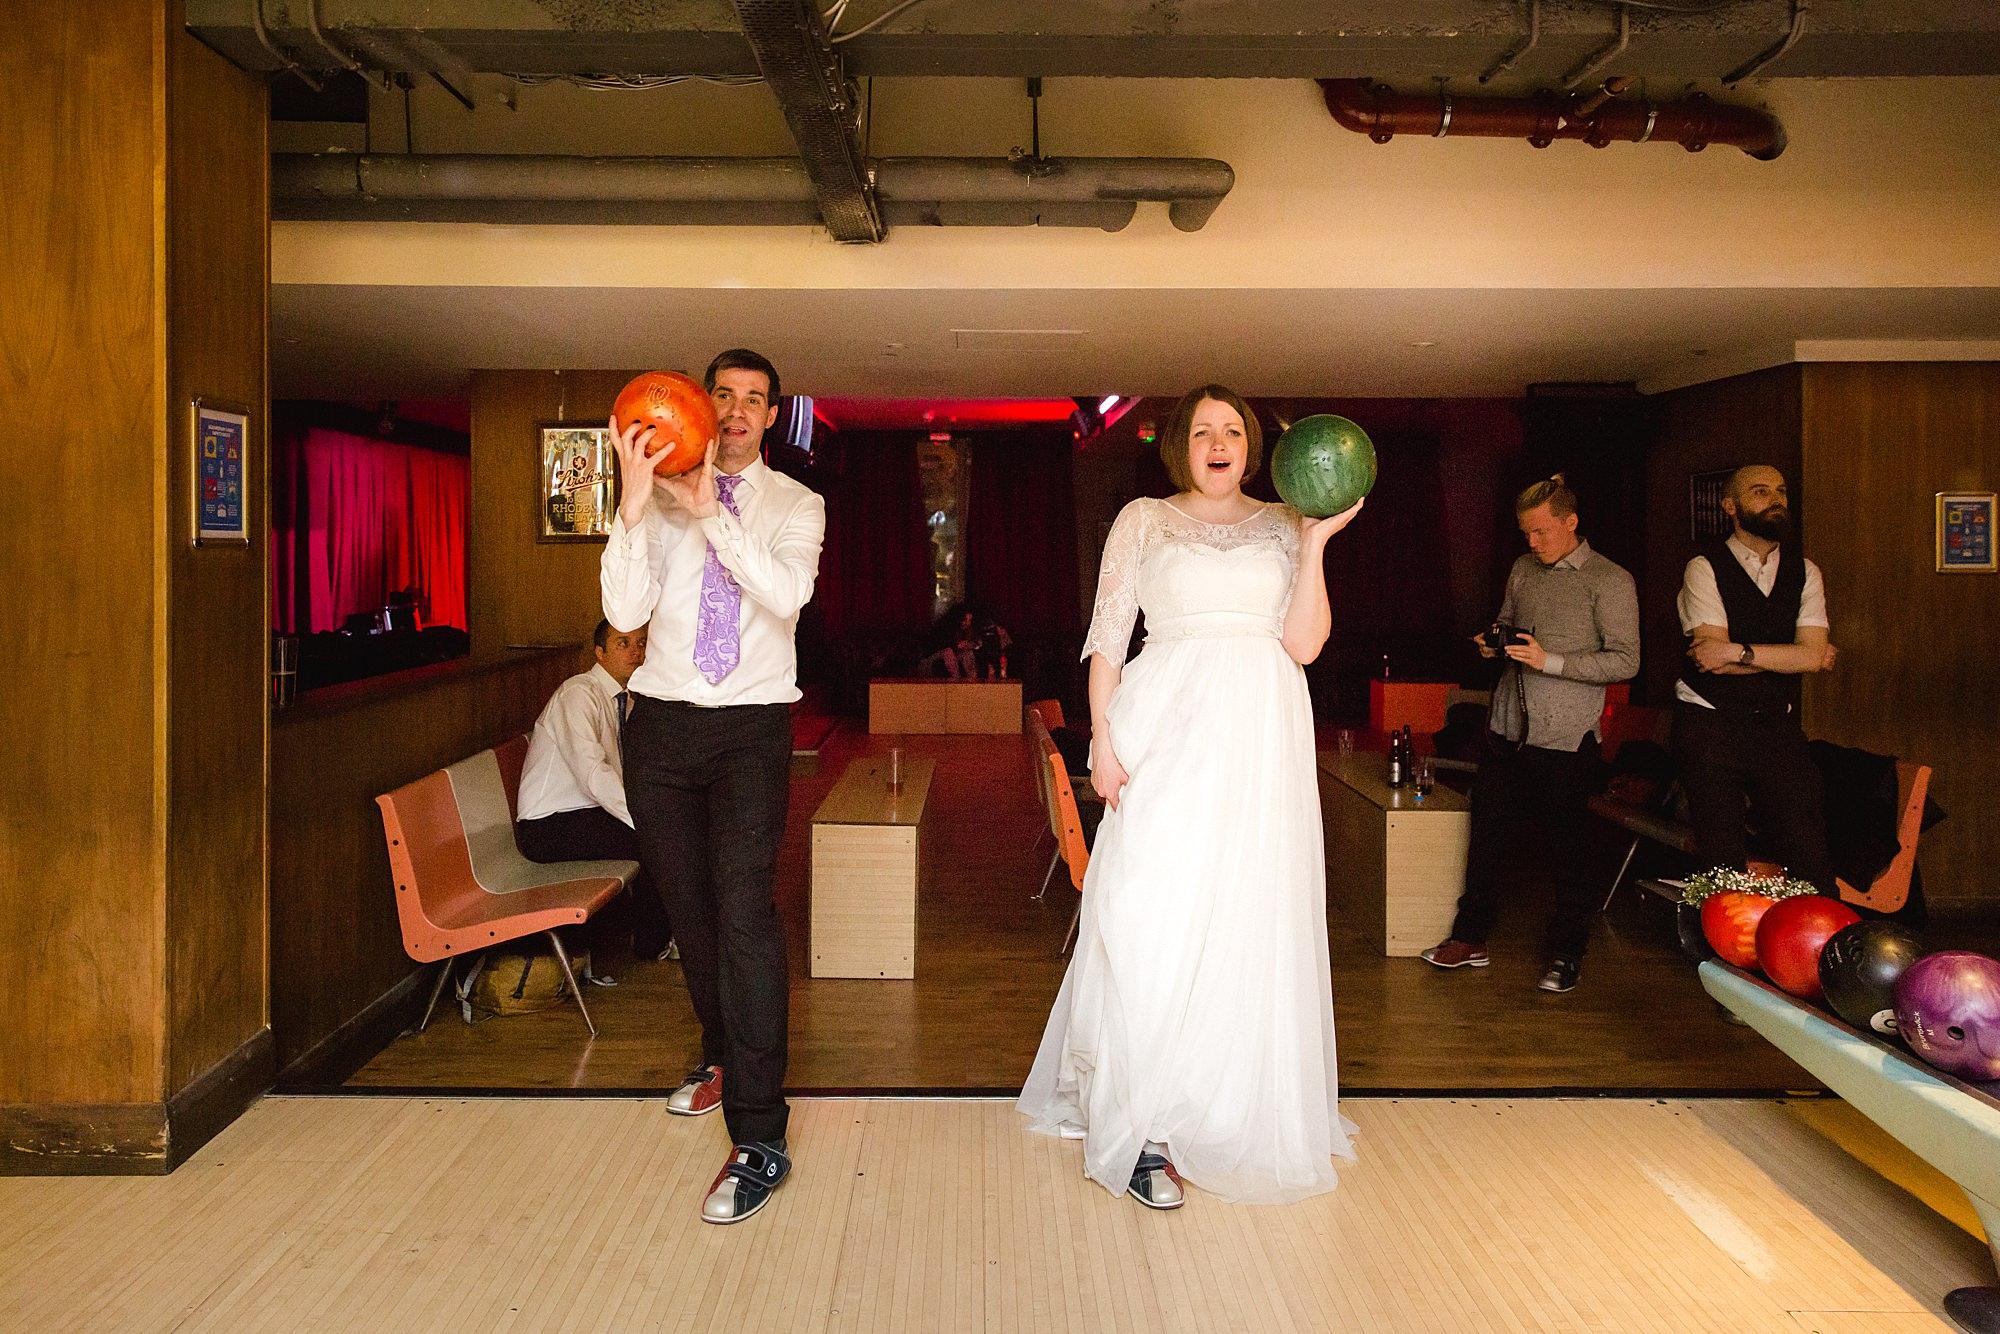 fun london wedding bowling bride and groom prepare to bowl